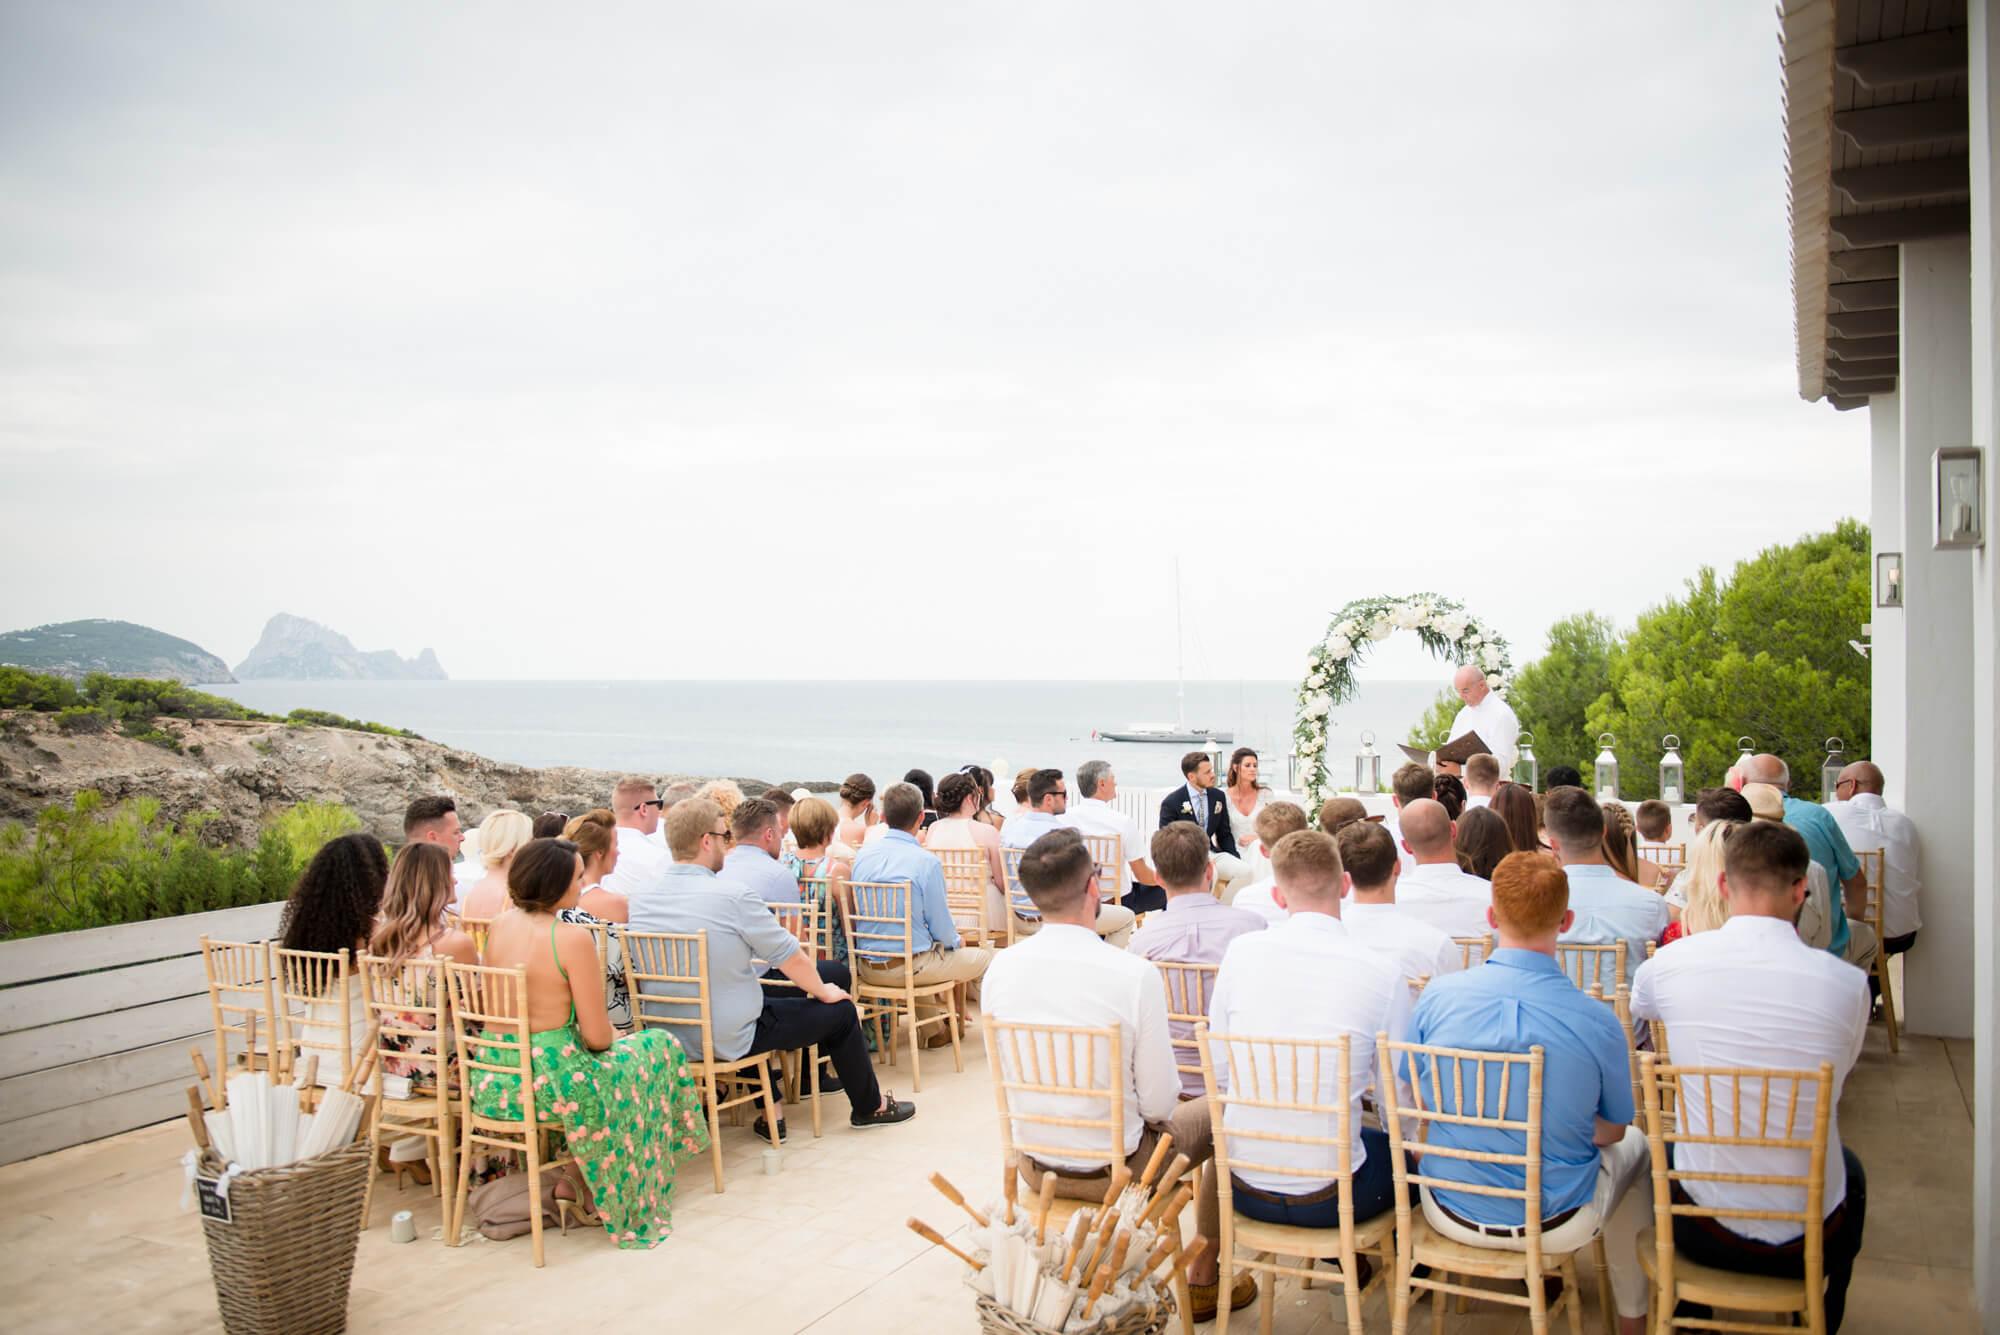 wedding ceremony venue seaside viw es vdra white flower arch